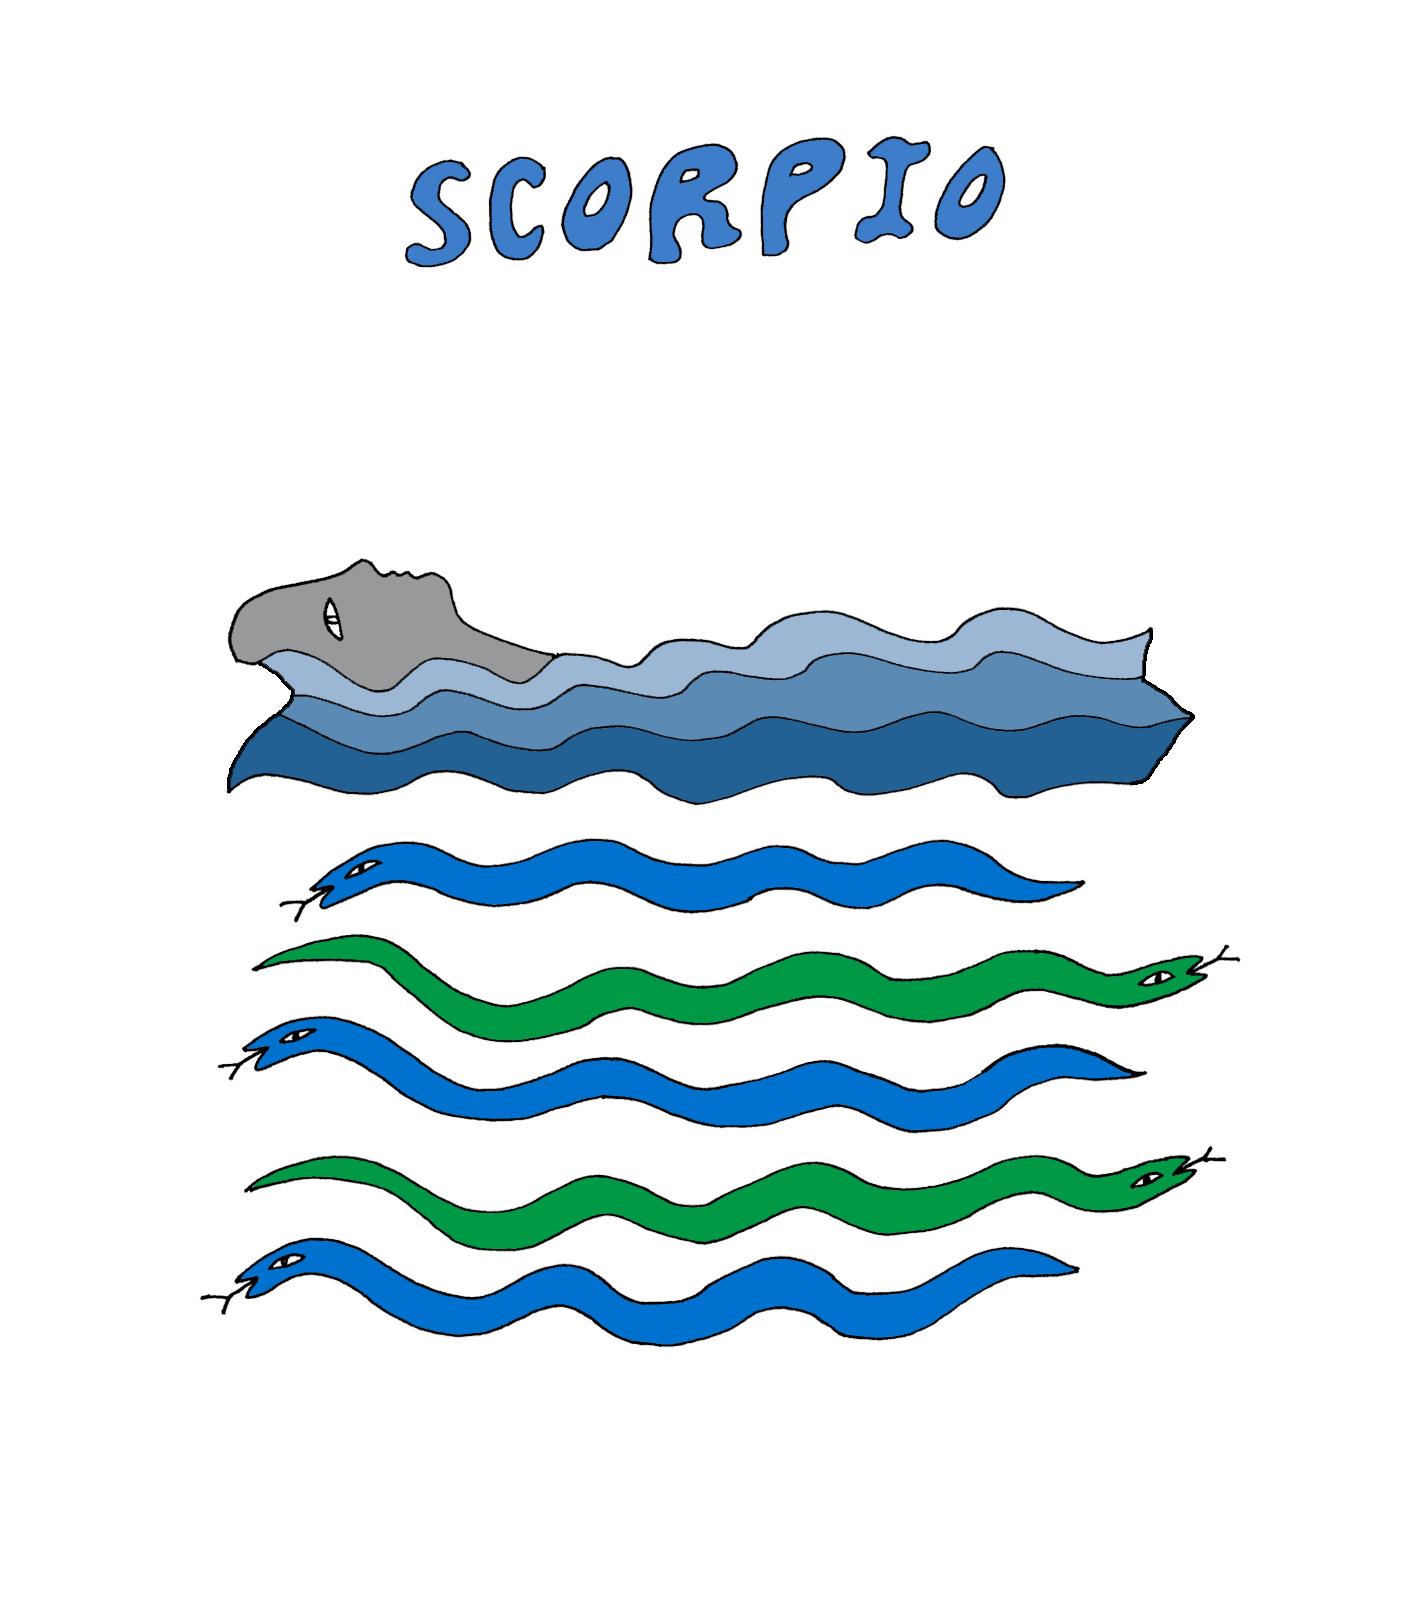 scorpio drawing.jpg